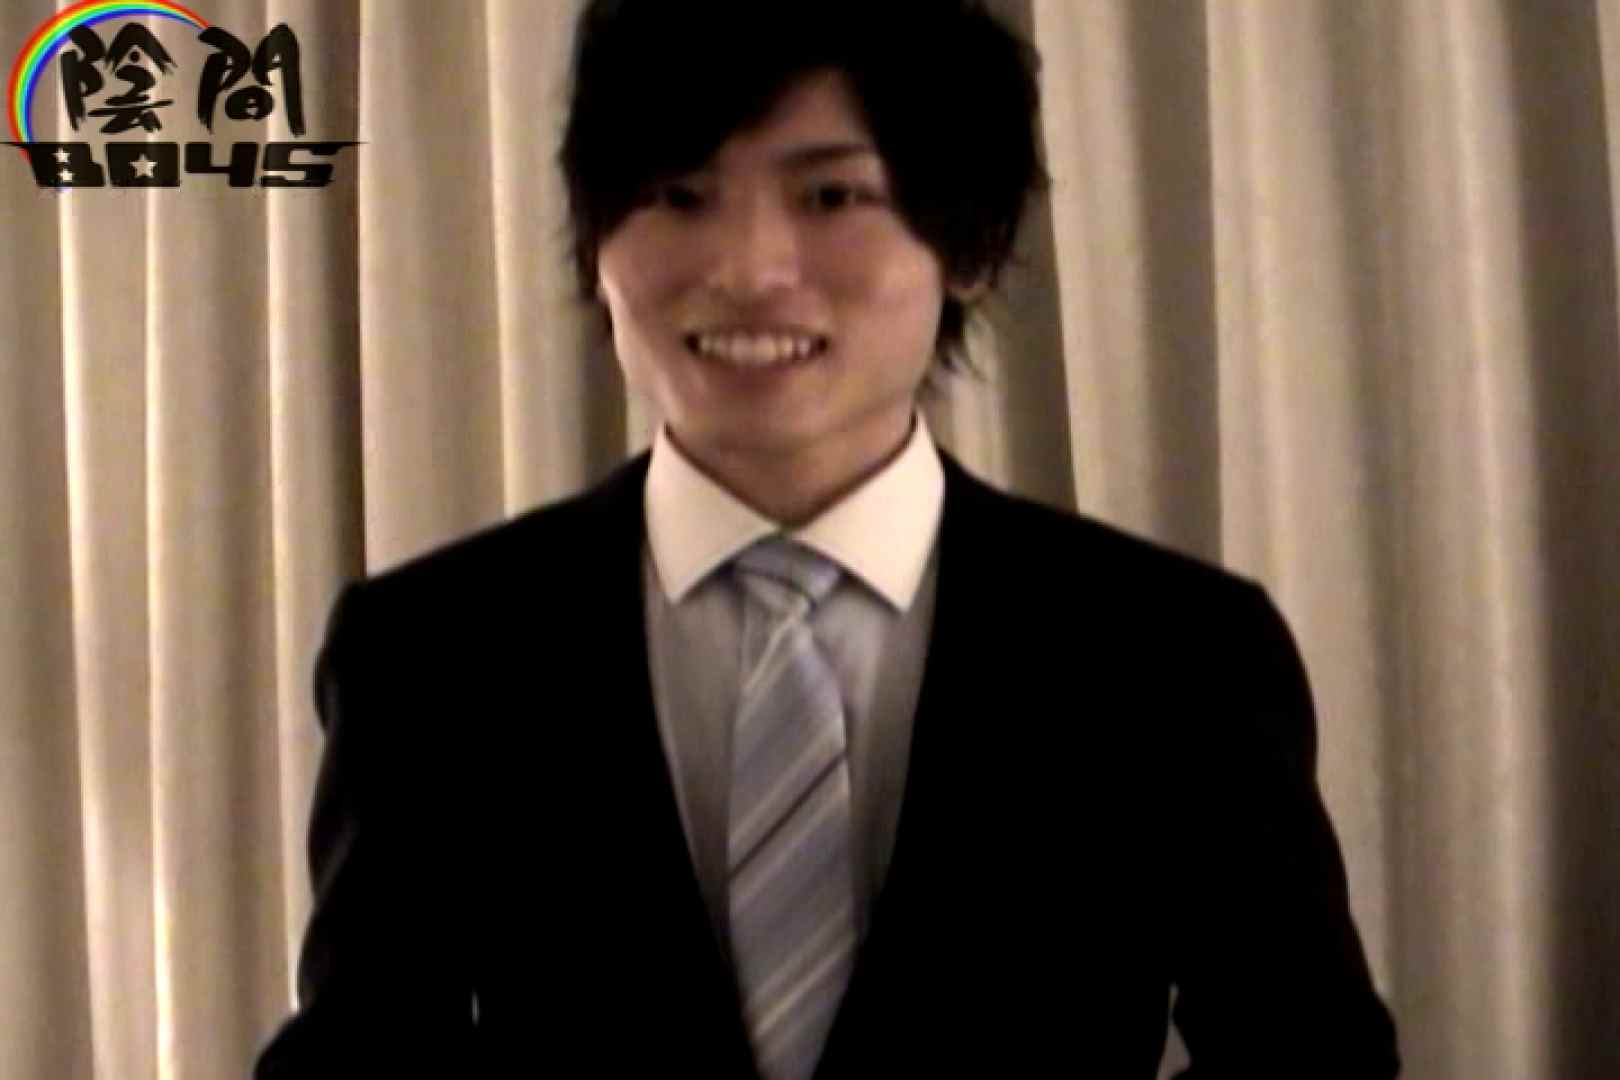 陰間BOYS~IKEMEN Interview~01  AV 男同士動画 94枚 34